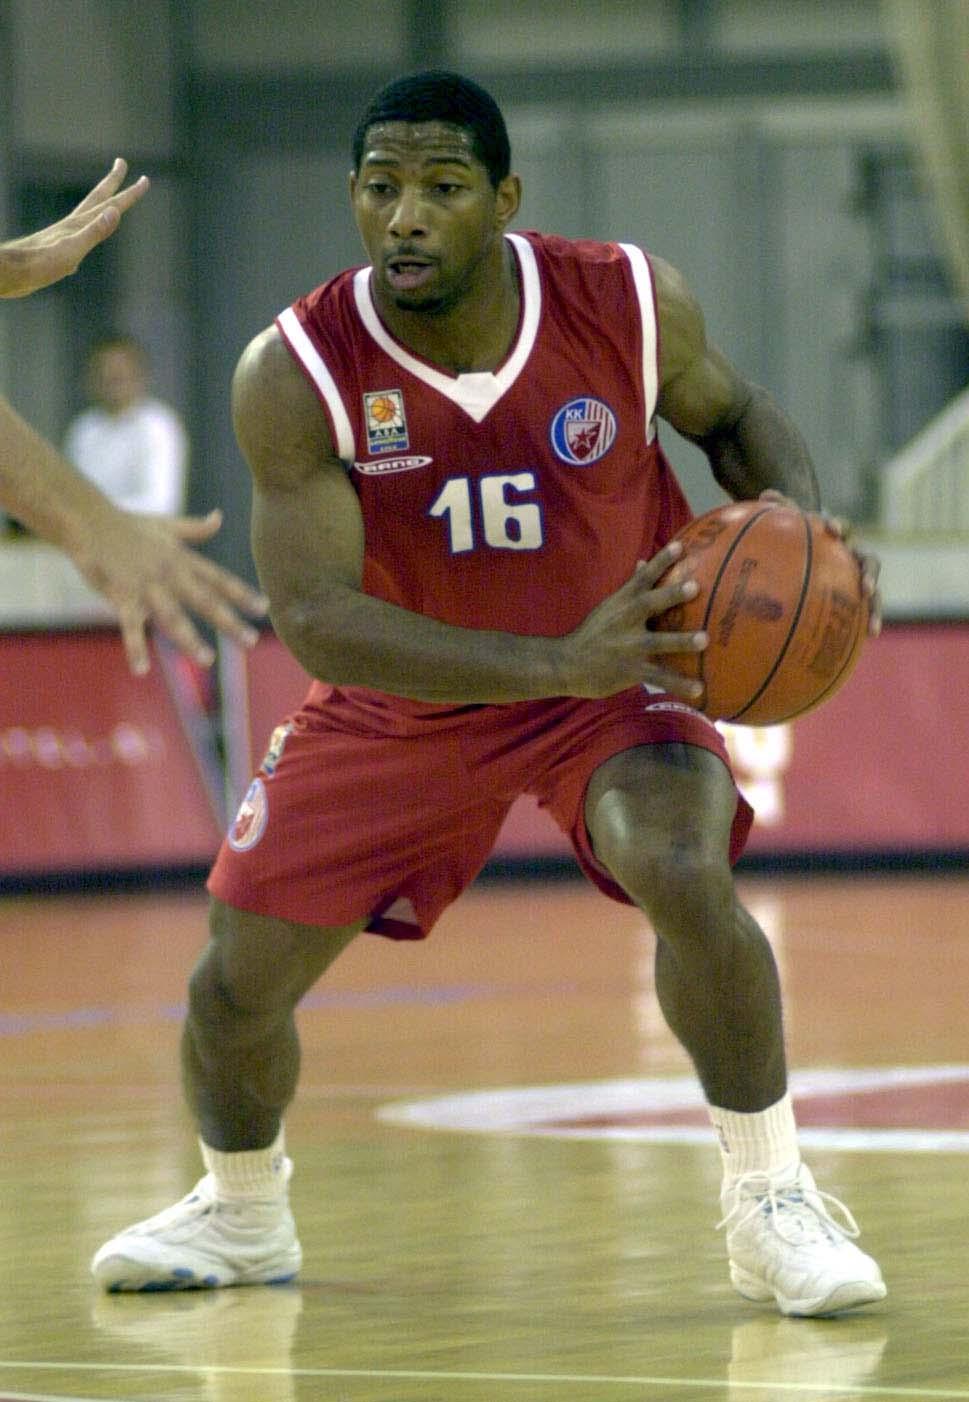 Amerikanac JAMES SCOONIE PENN Skuni Pen kosarkas Crvene zvezde na utakmici Jadranske Goodyear lige protiv Olimpije iz Ljubljane u hali Tivoli28.09.2002. godineFoto: Marko Metlas